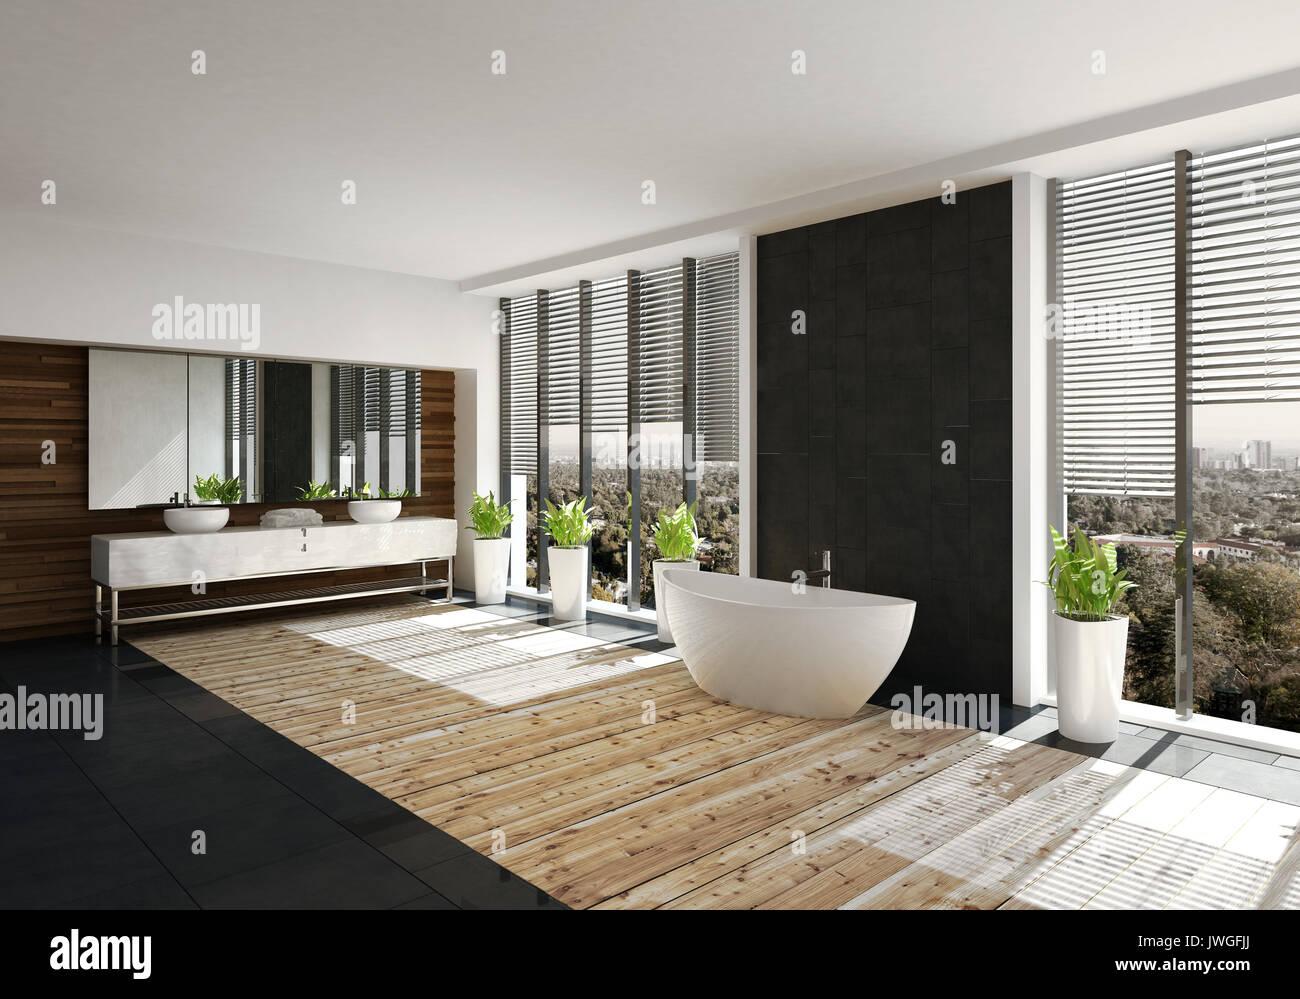 Awesome Vanite Salle De Bain Moderne Contemporary - House Design ...